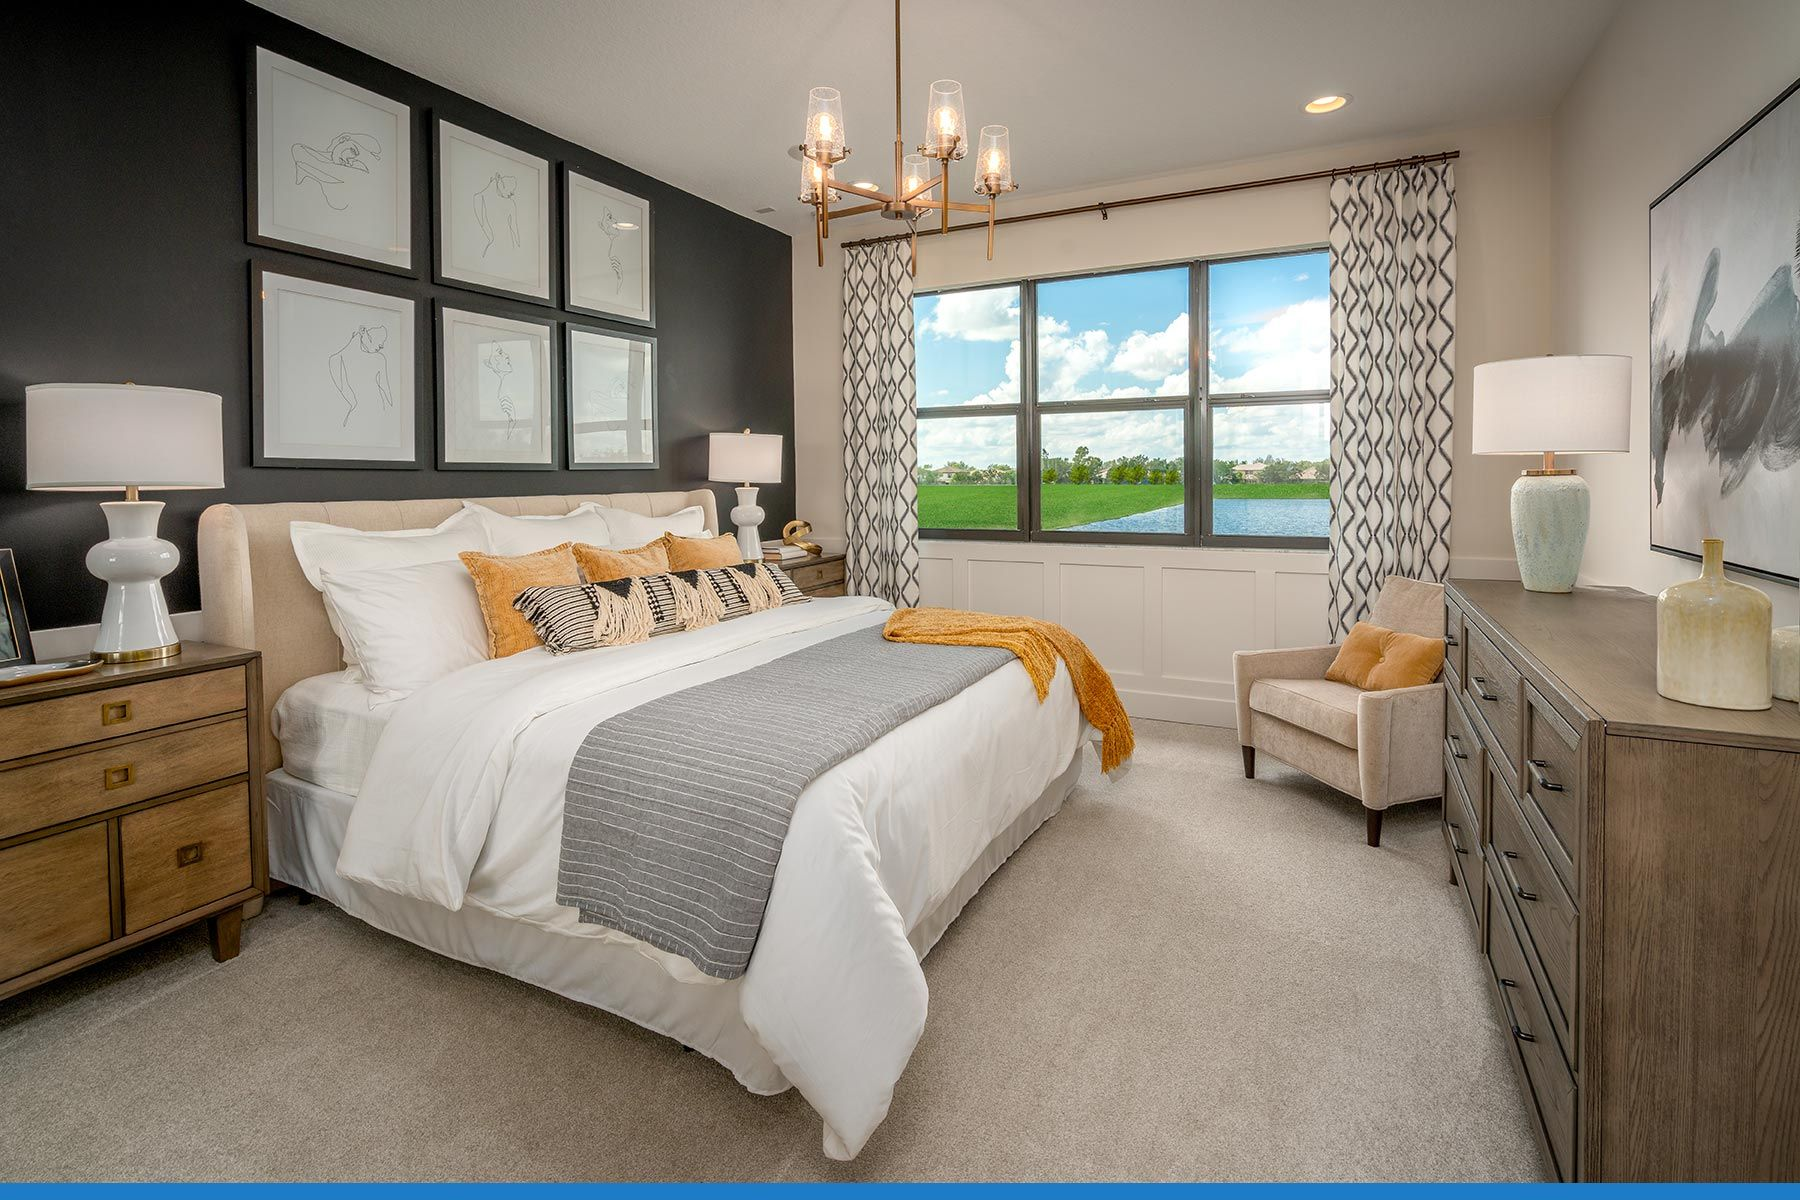 Lake Worth - Saddlewood:Ellery Townhome - Owner's Suite